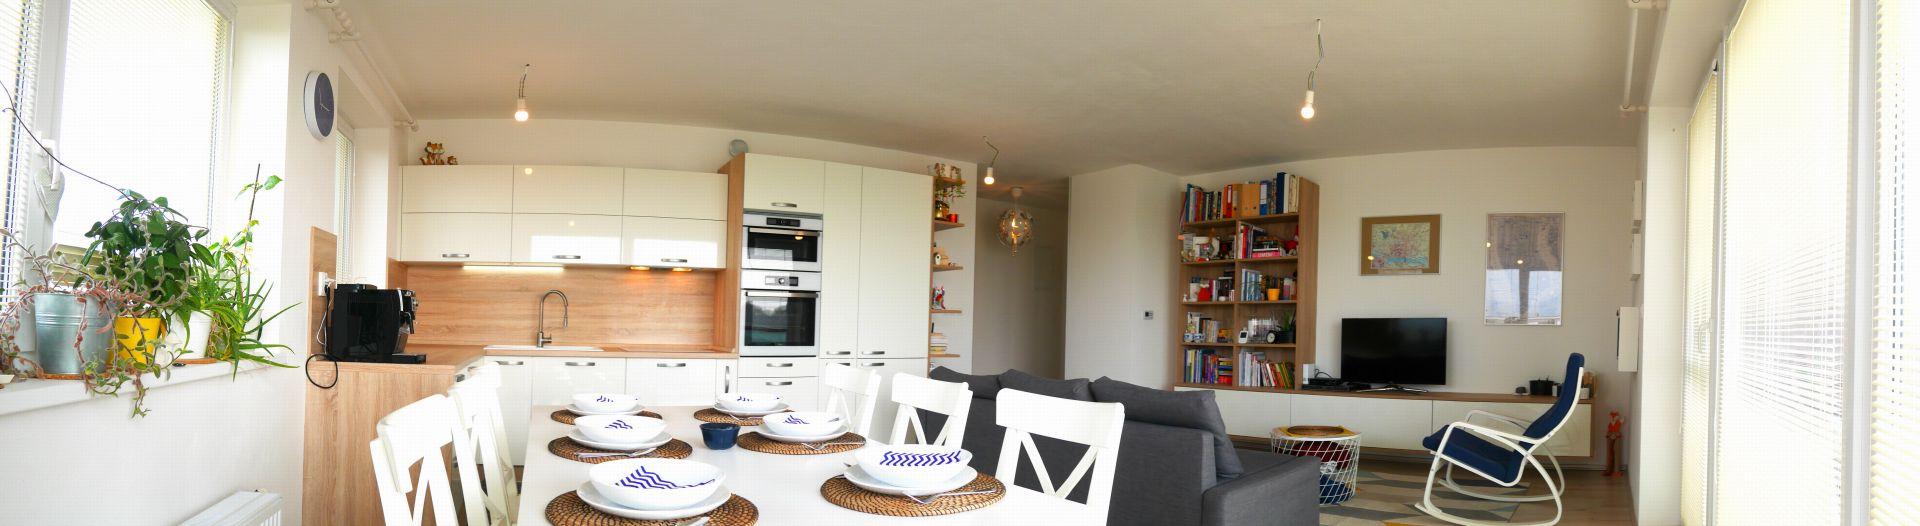 3 - izbový byt na Čiernej Vode